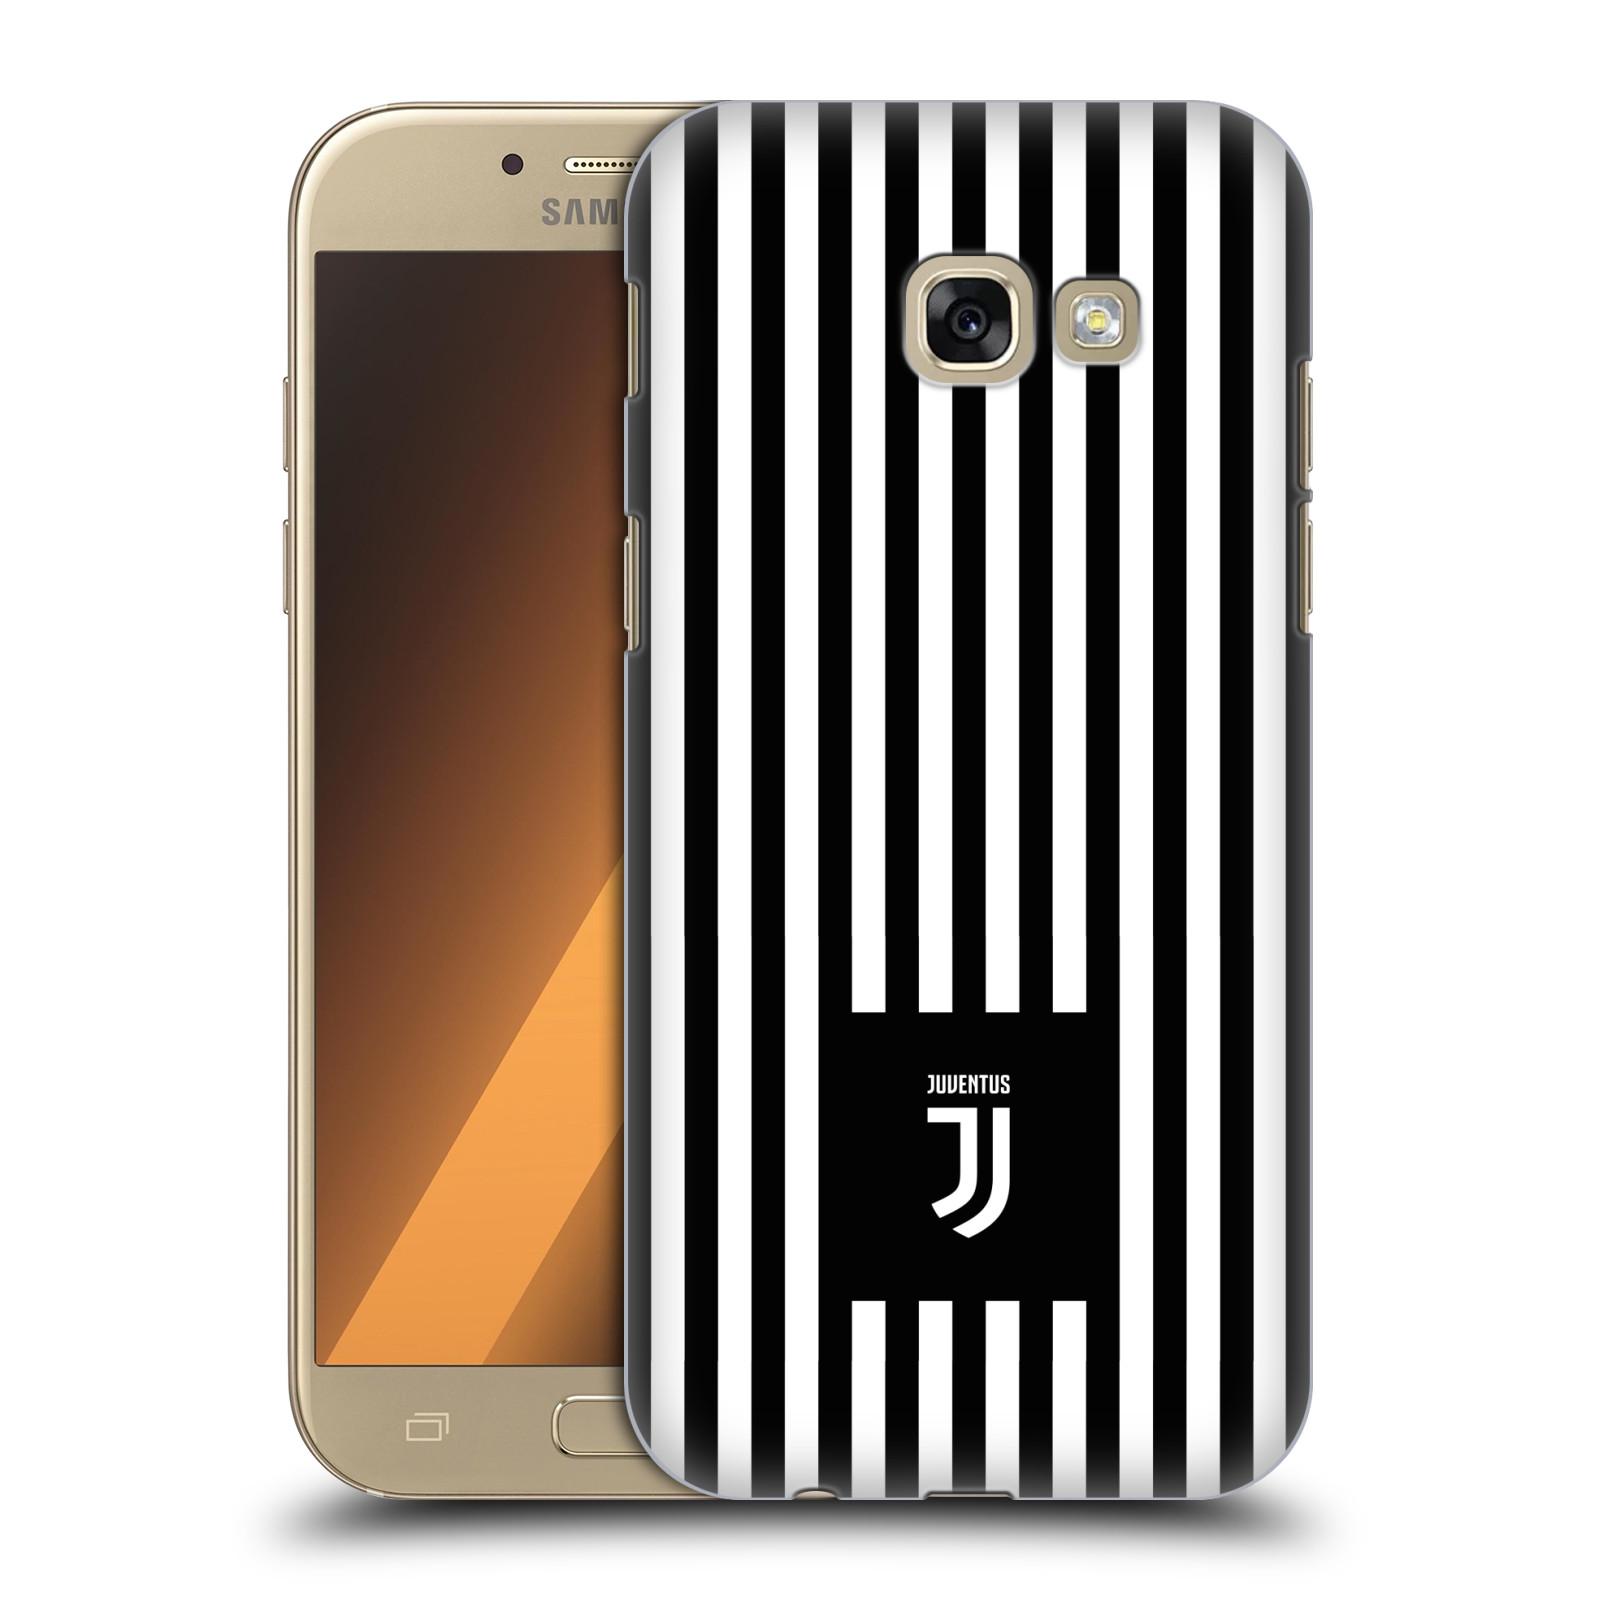 Plastové pouzdro na mobil Samsung Galaxy A5 (2017) - Head Case - Juventus FC - Nové logo - Pruhy